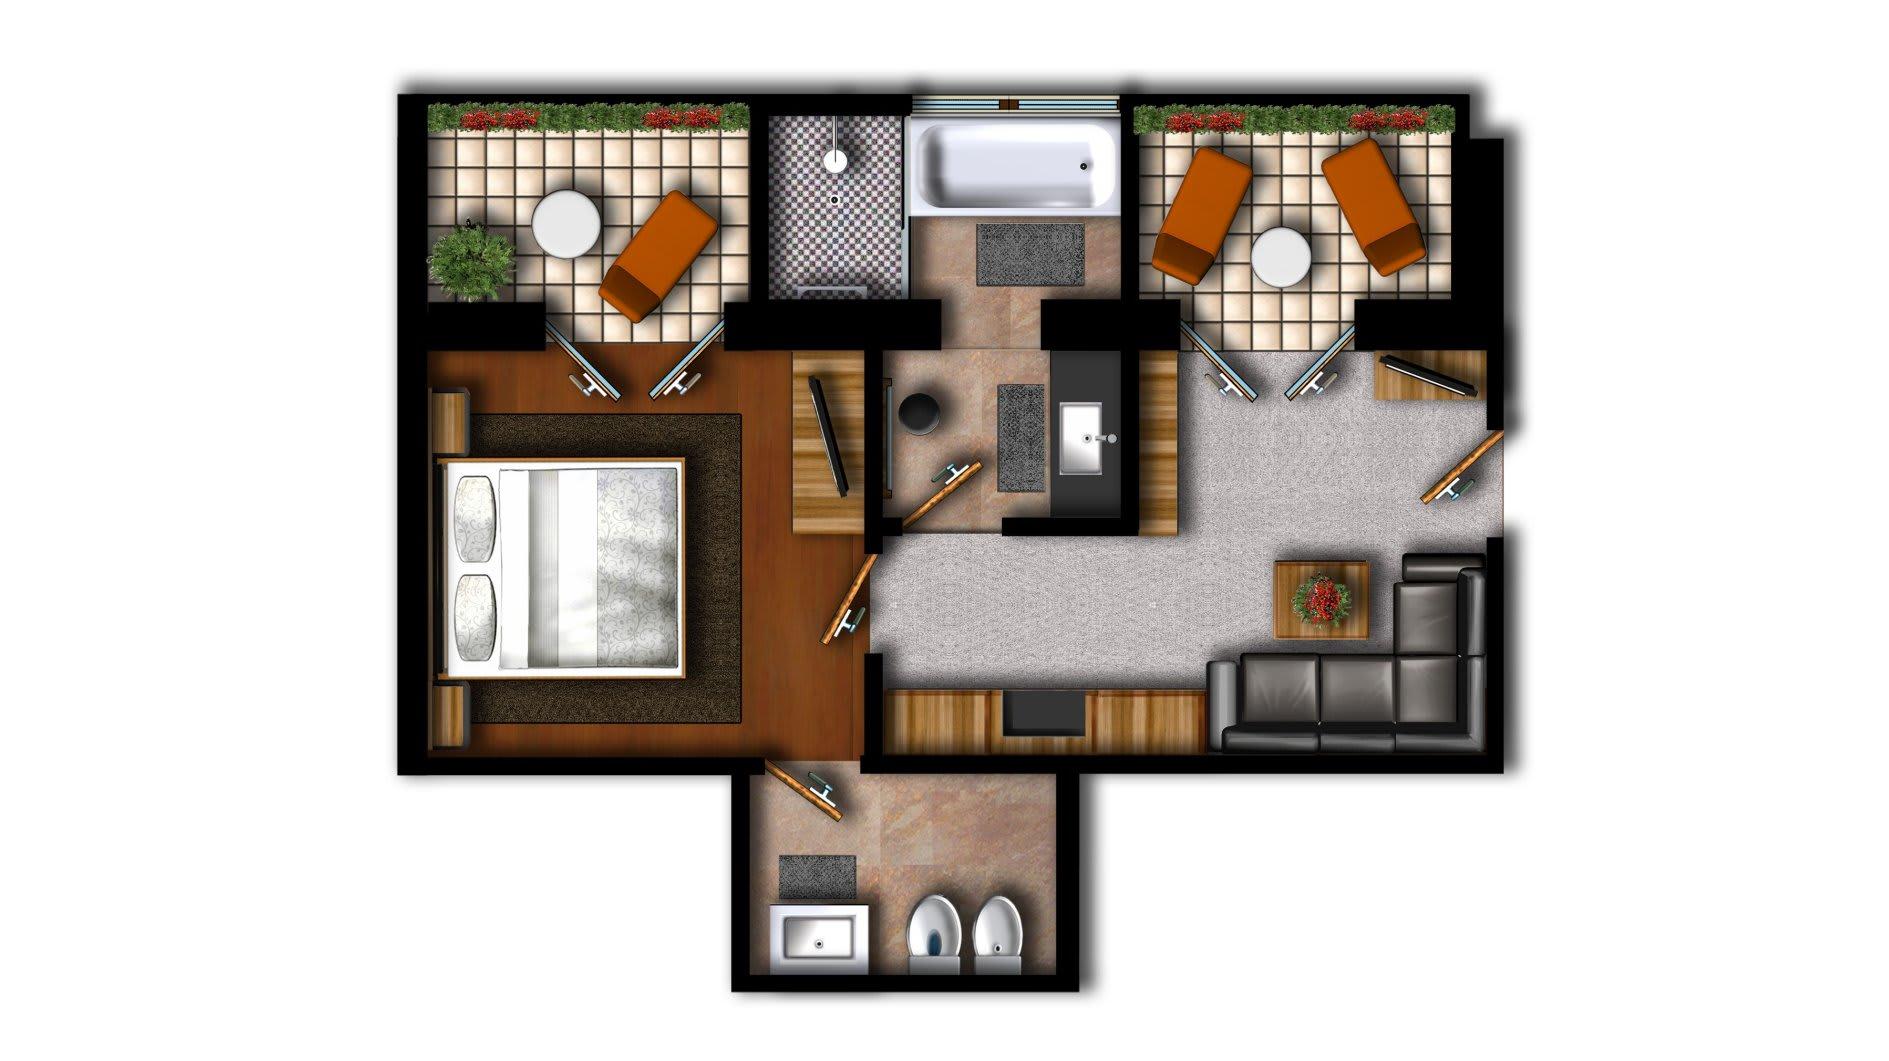 Dppelzimmer Meran